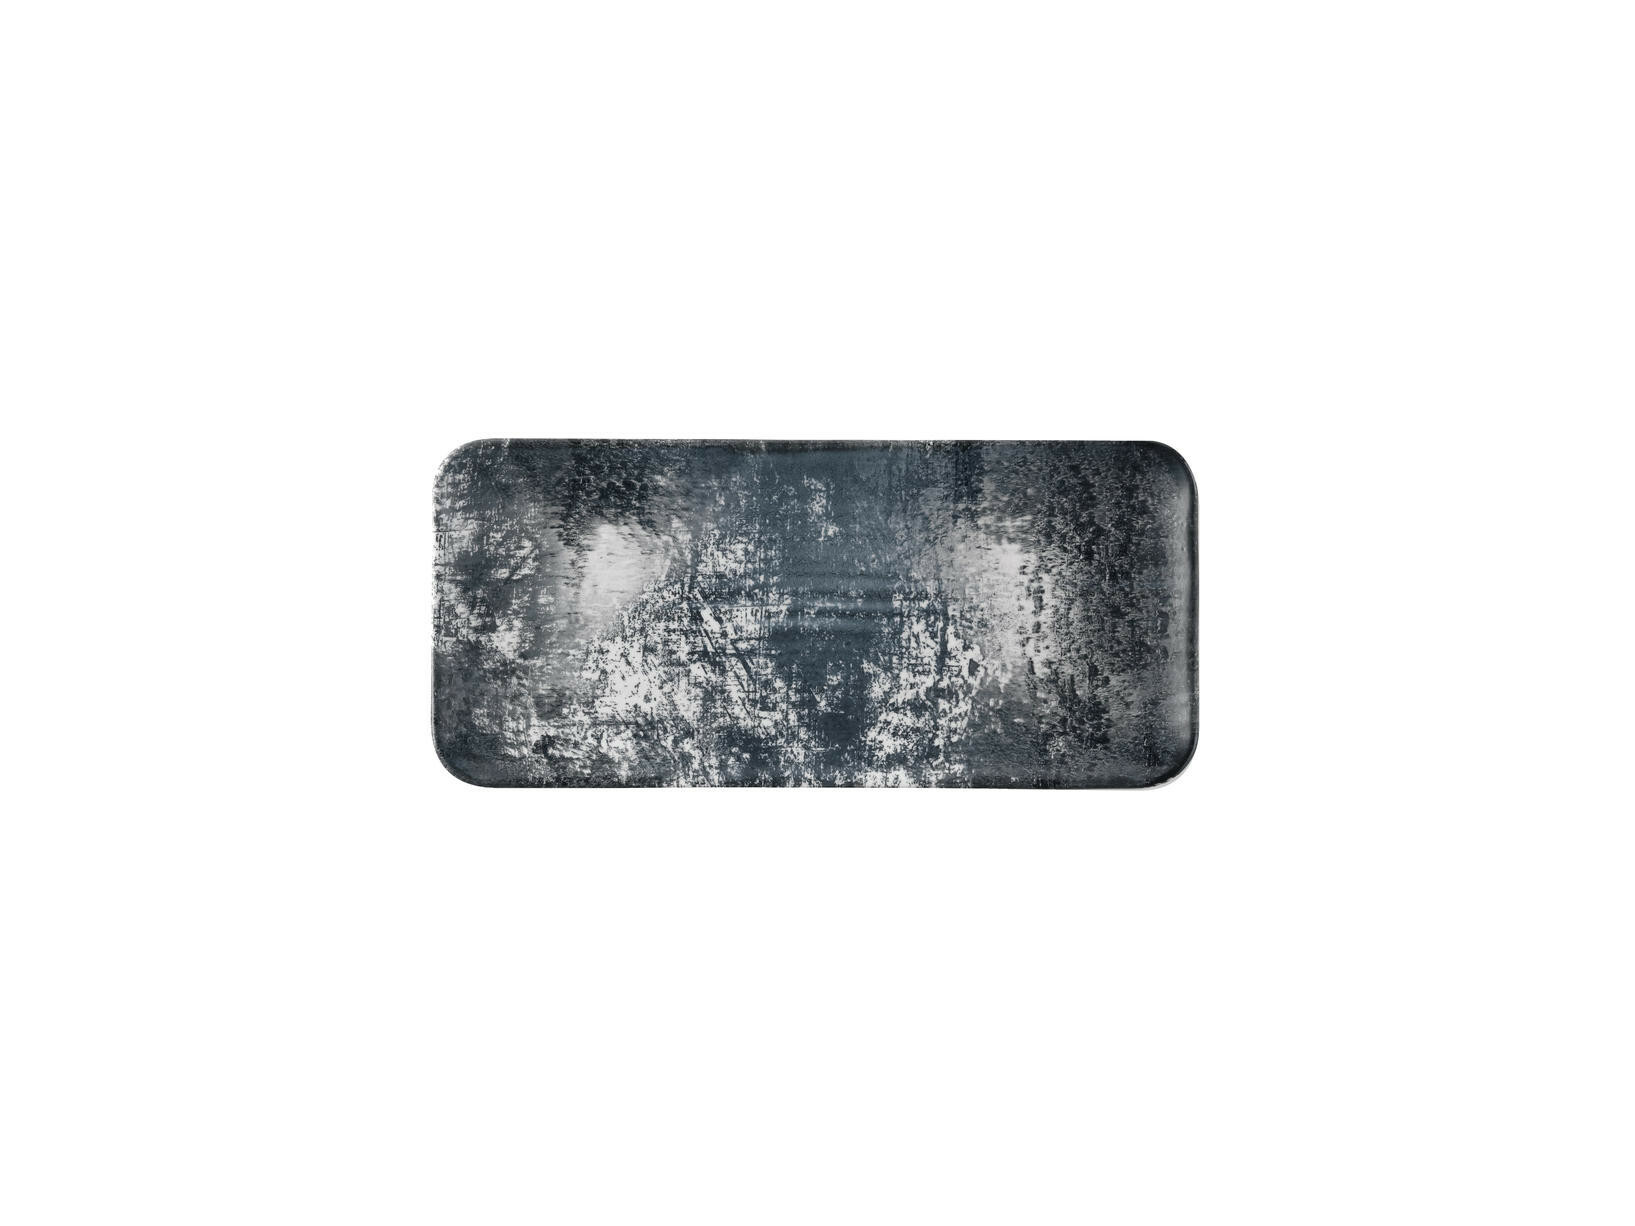 Dudson Urban Lamp Black organic rectangular plate 34,6 x 15,6 cm